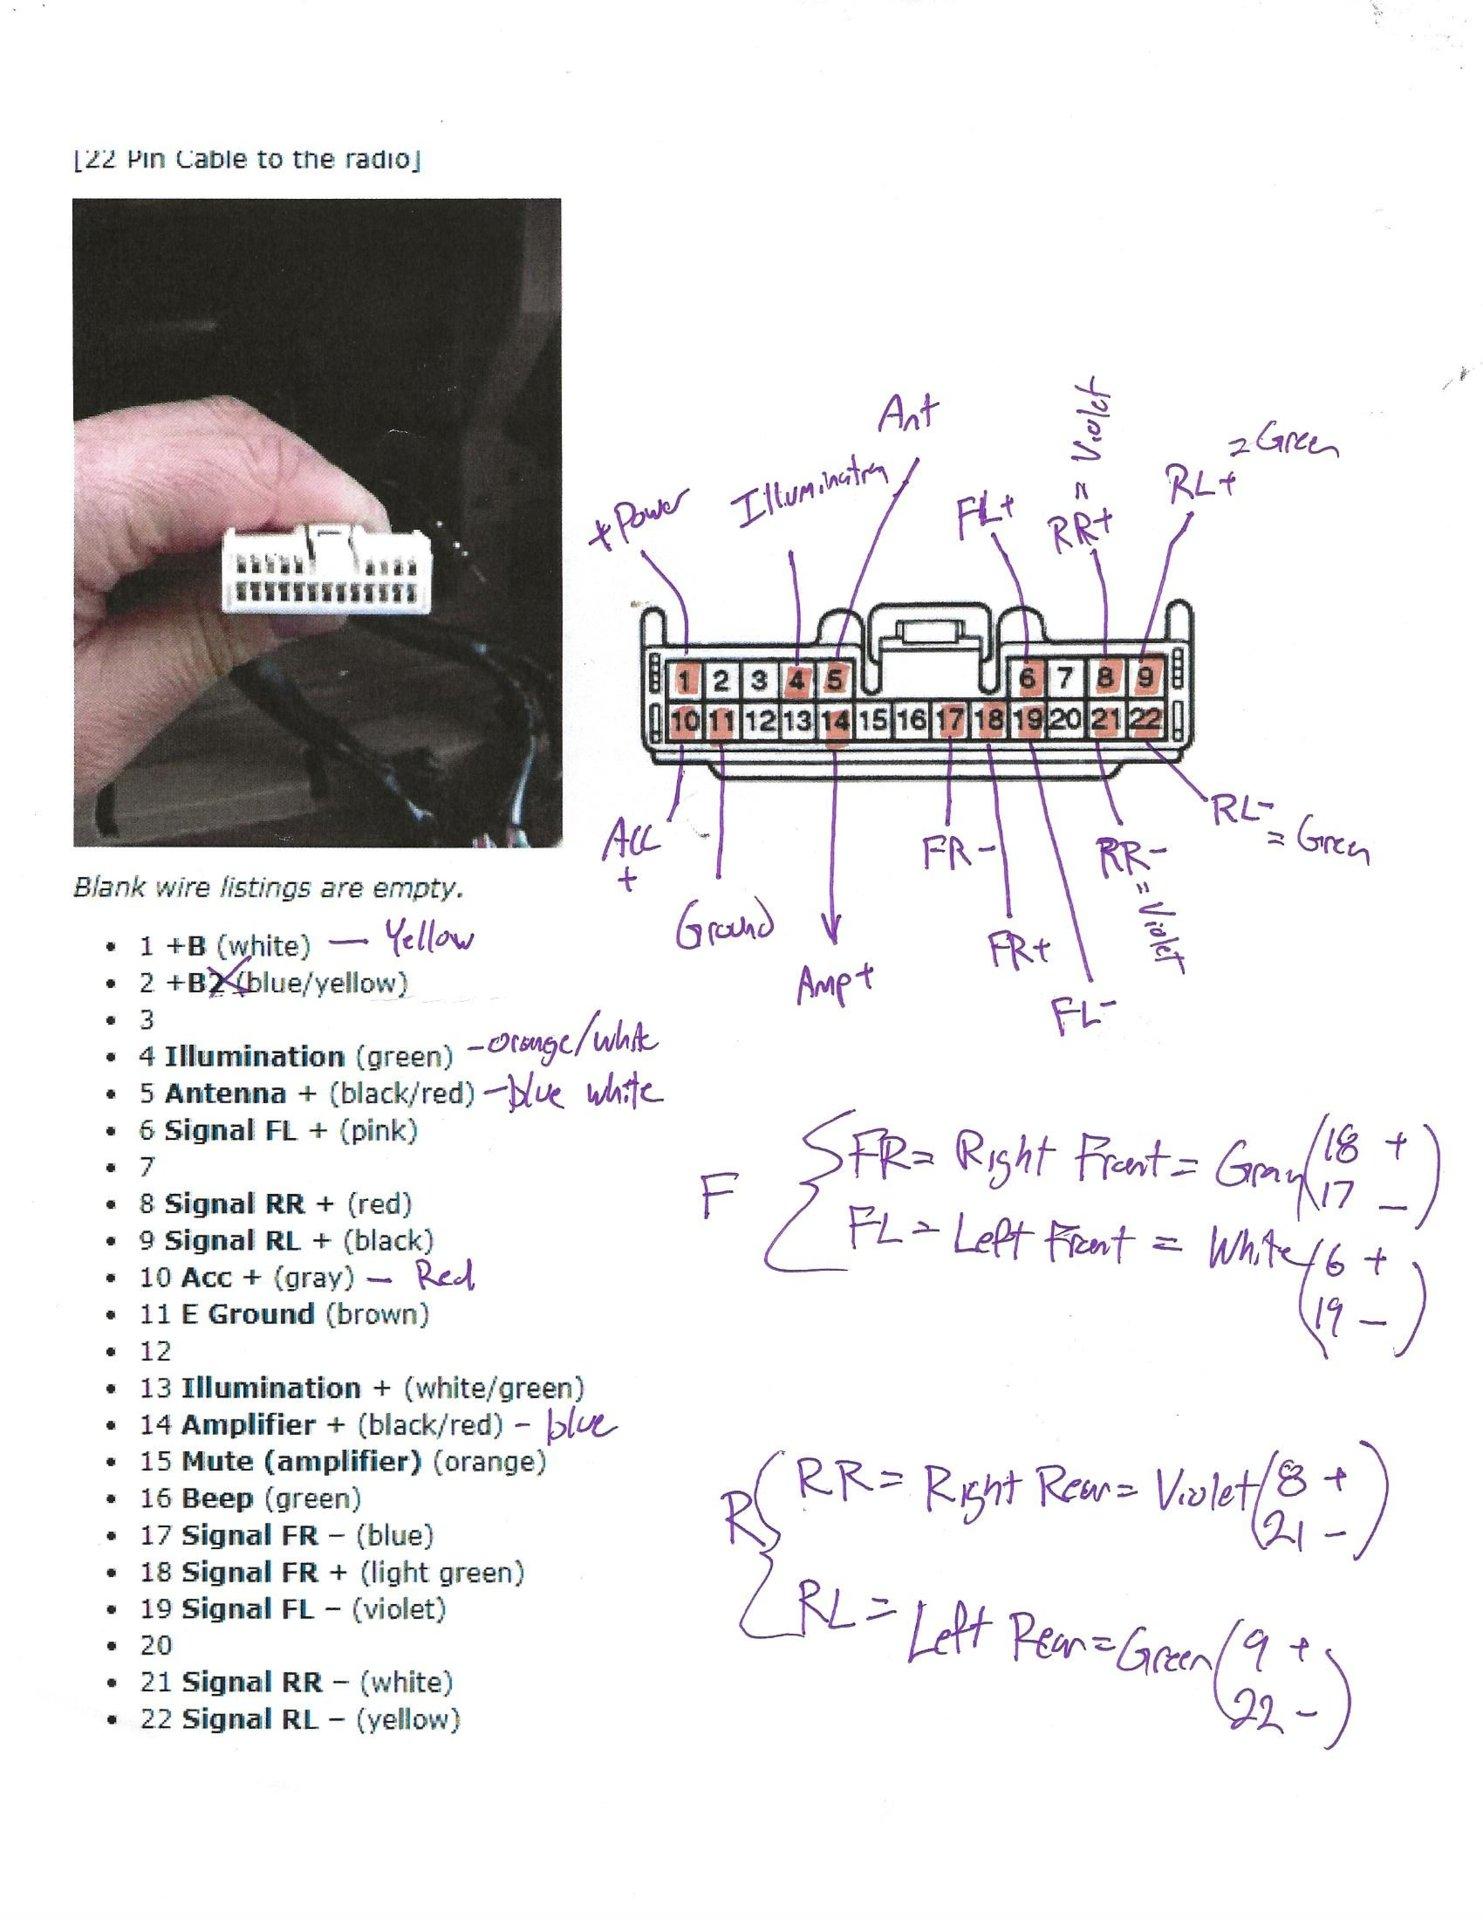 Stereo Wiring Harness Legend.jpg